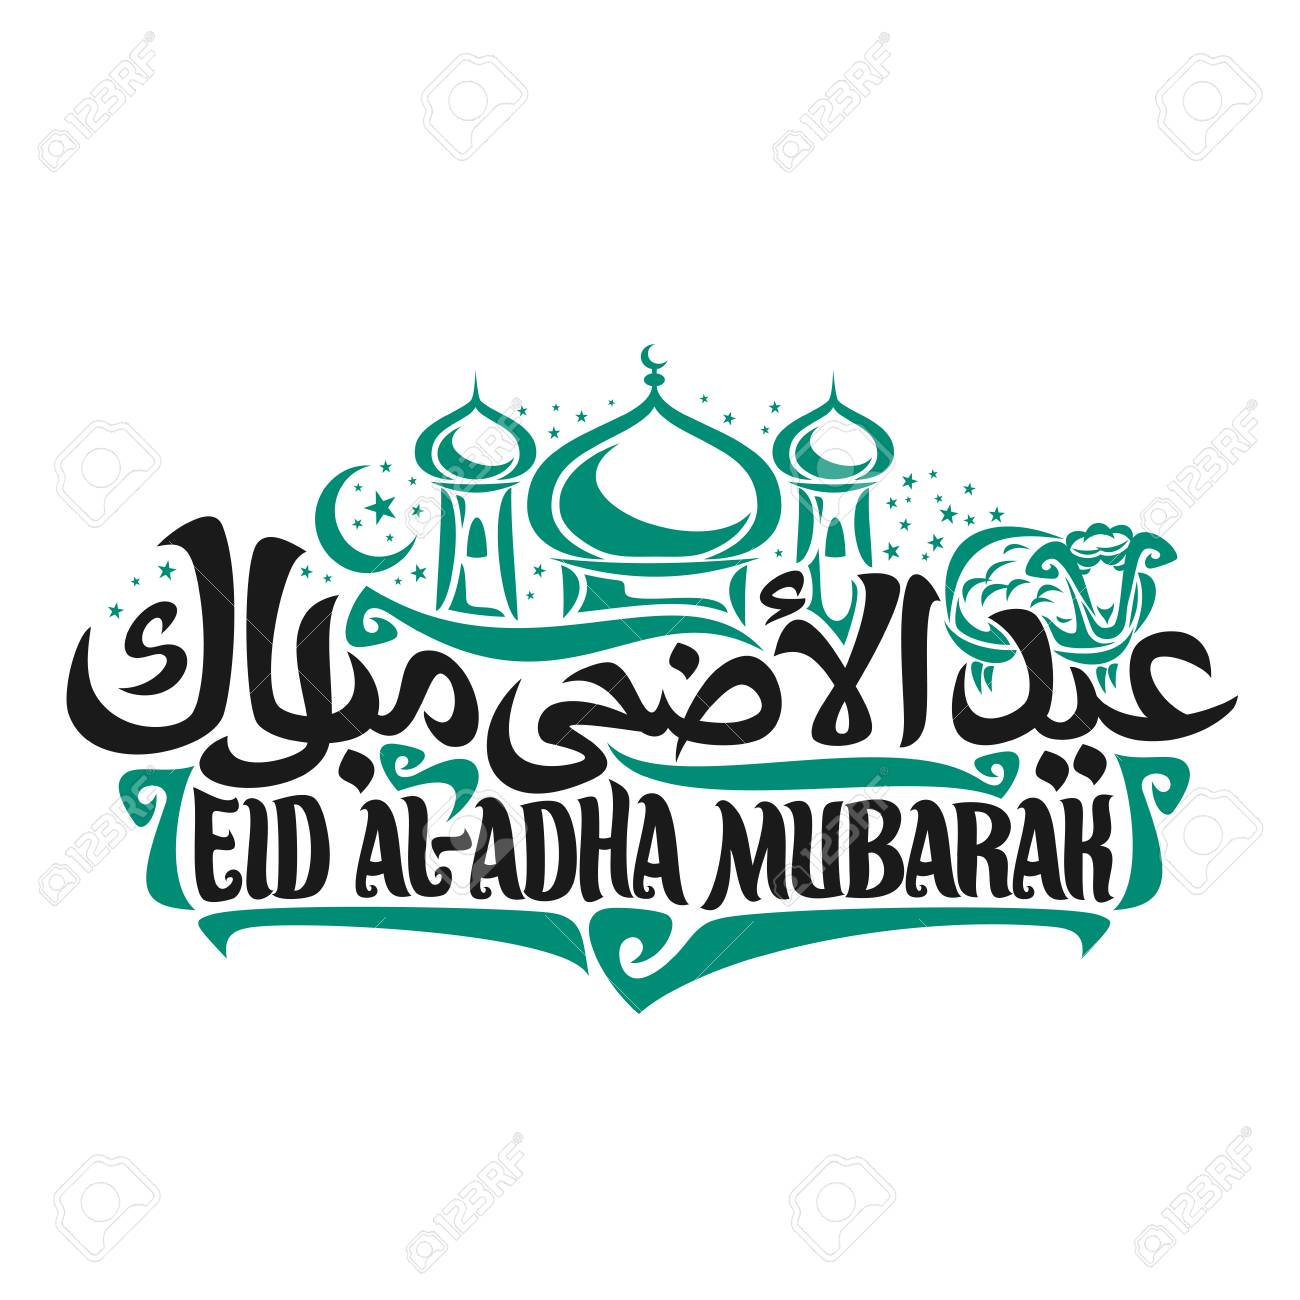 Vector for muslim greeting calligraphy Eid ul-Adha Mubarak,